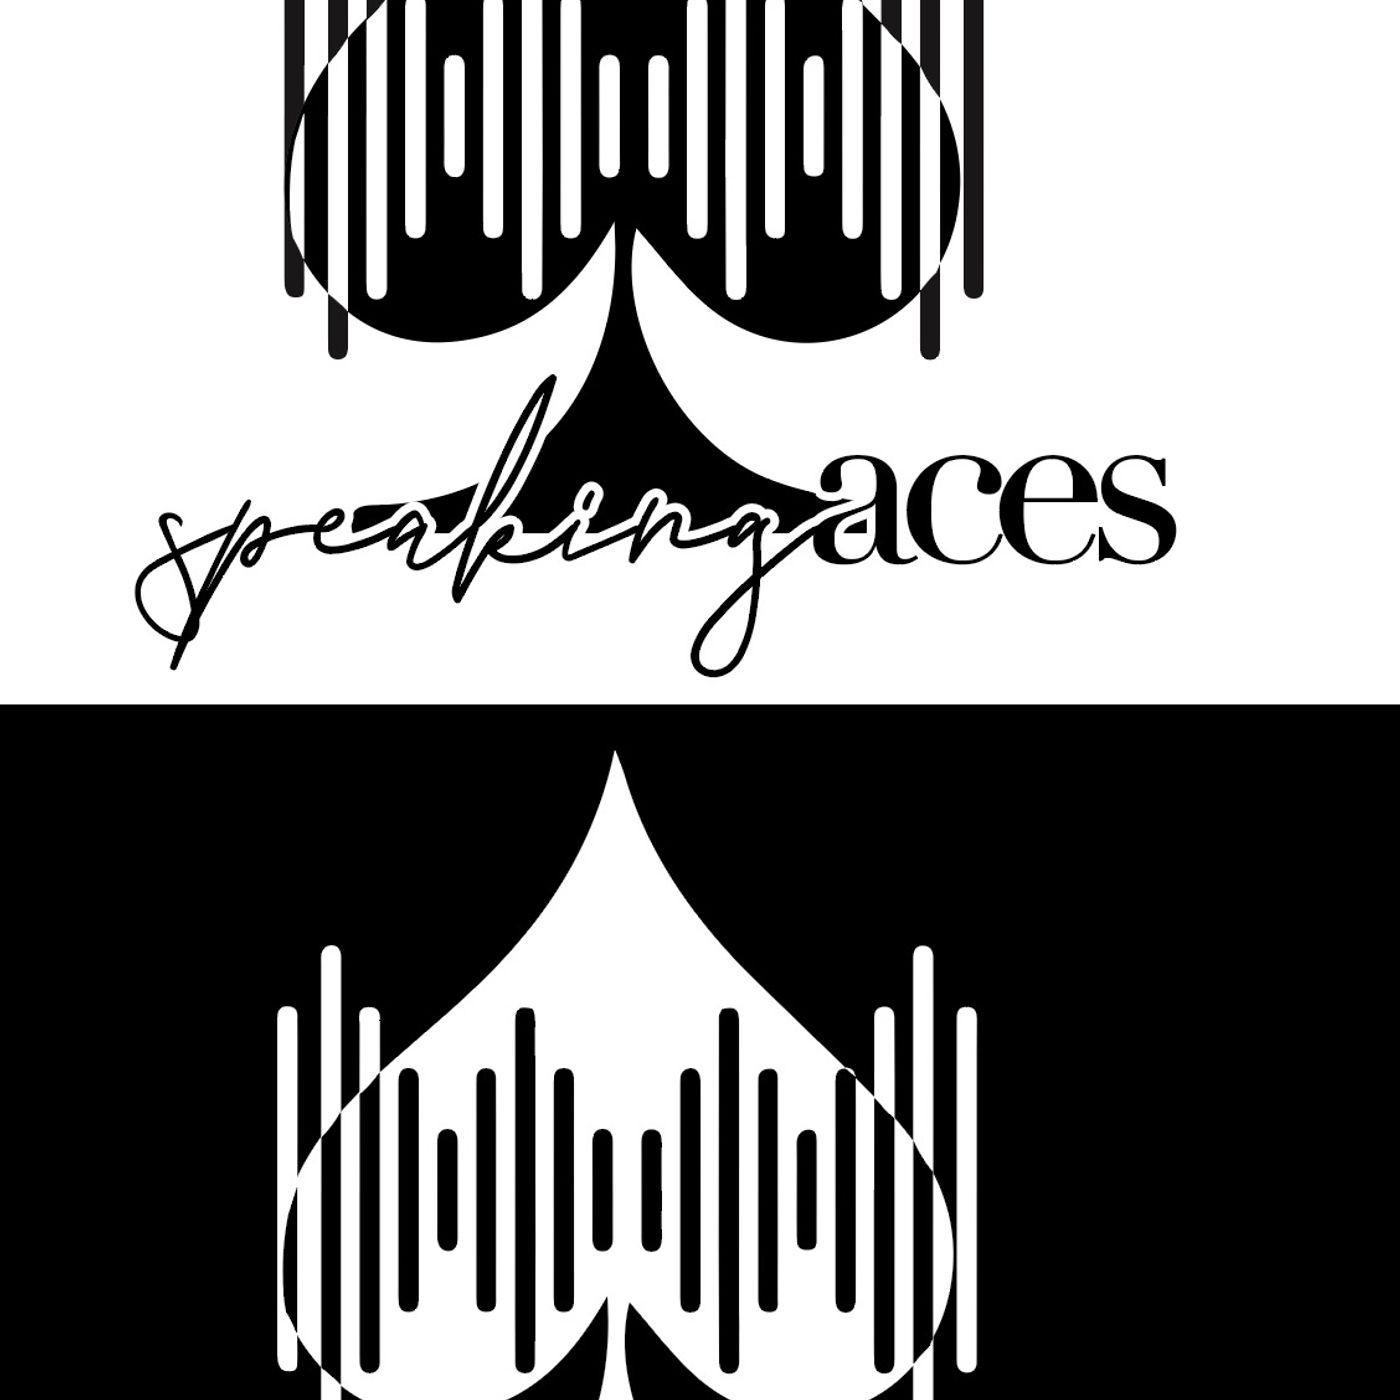 Spoken Aces: The Introduction